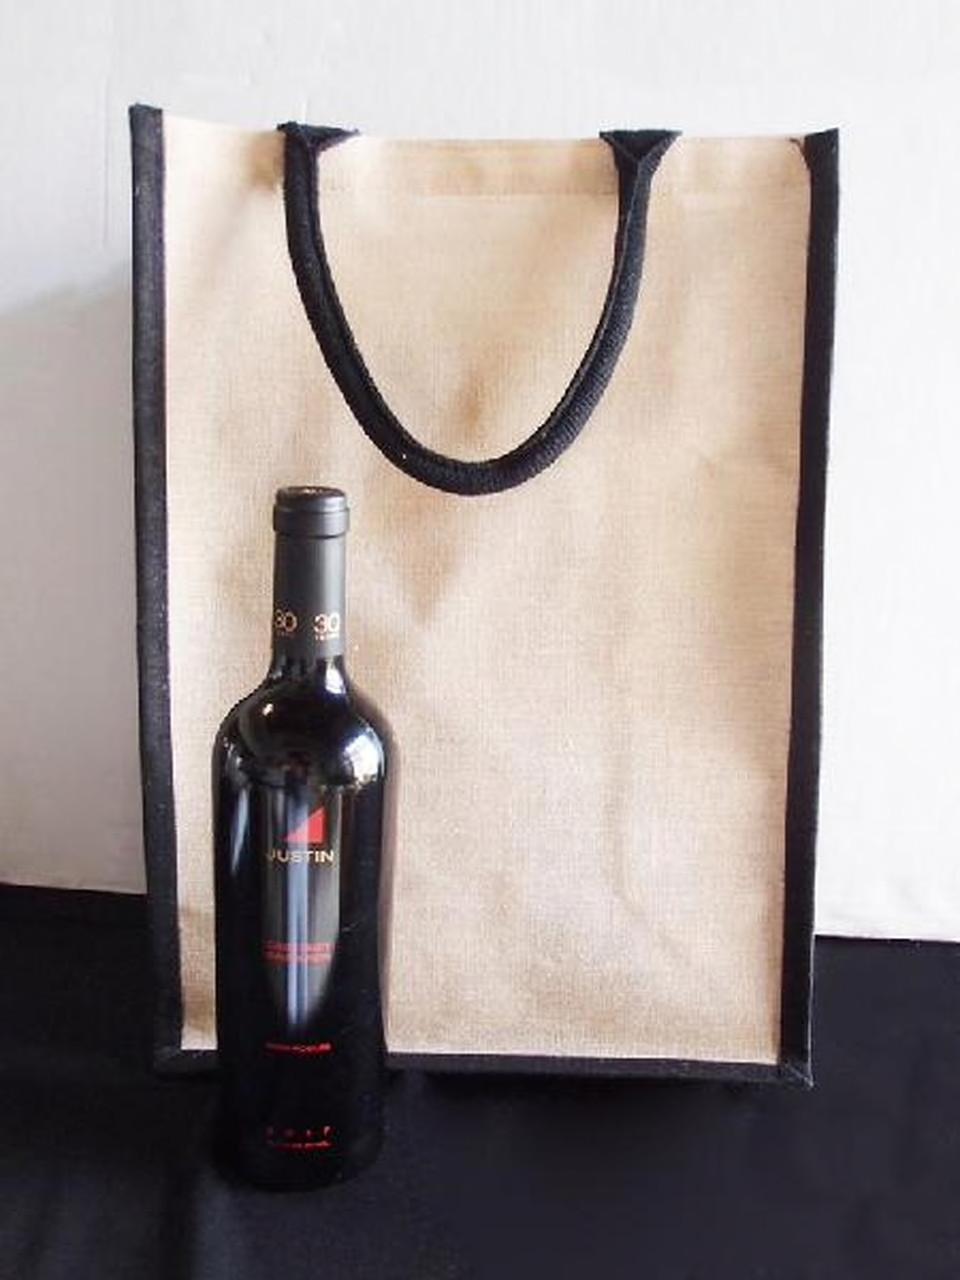 Jute Tote Bag with Black Trim as Wine Tote Bag, Wholesale Tote Bags